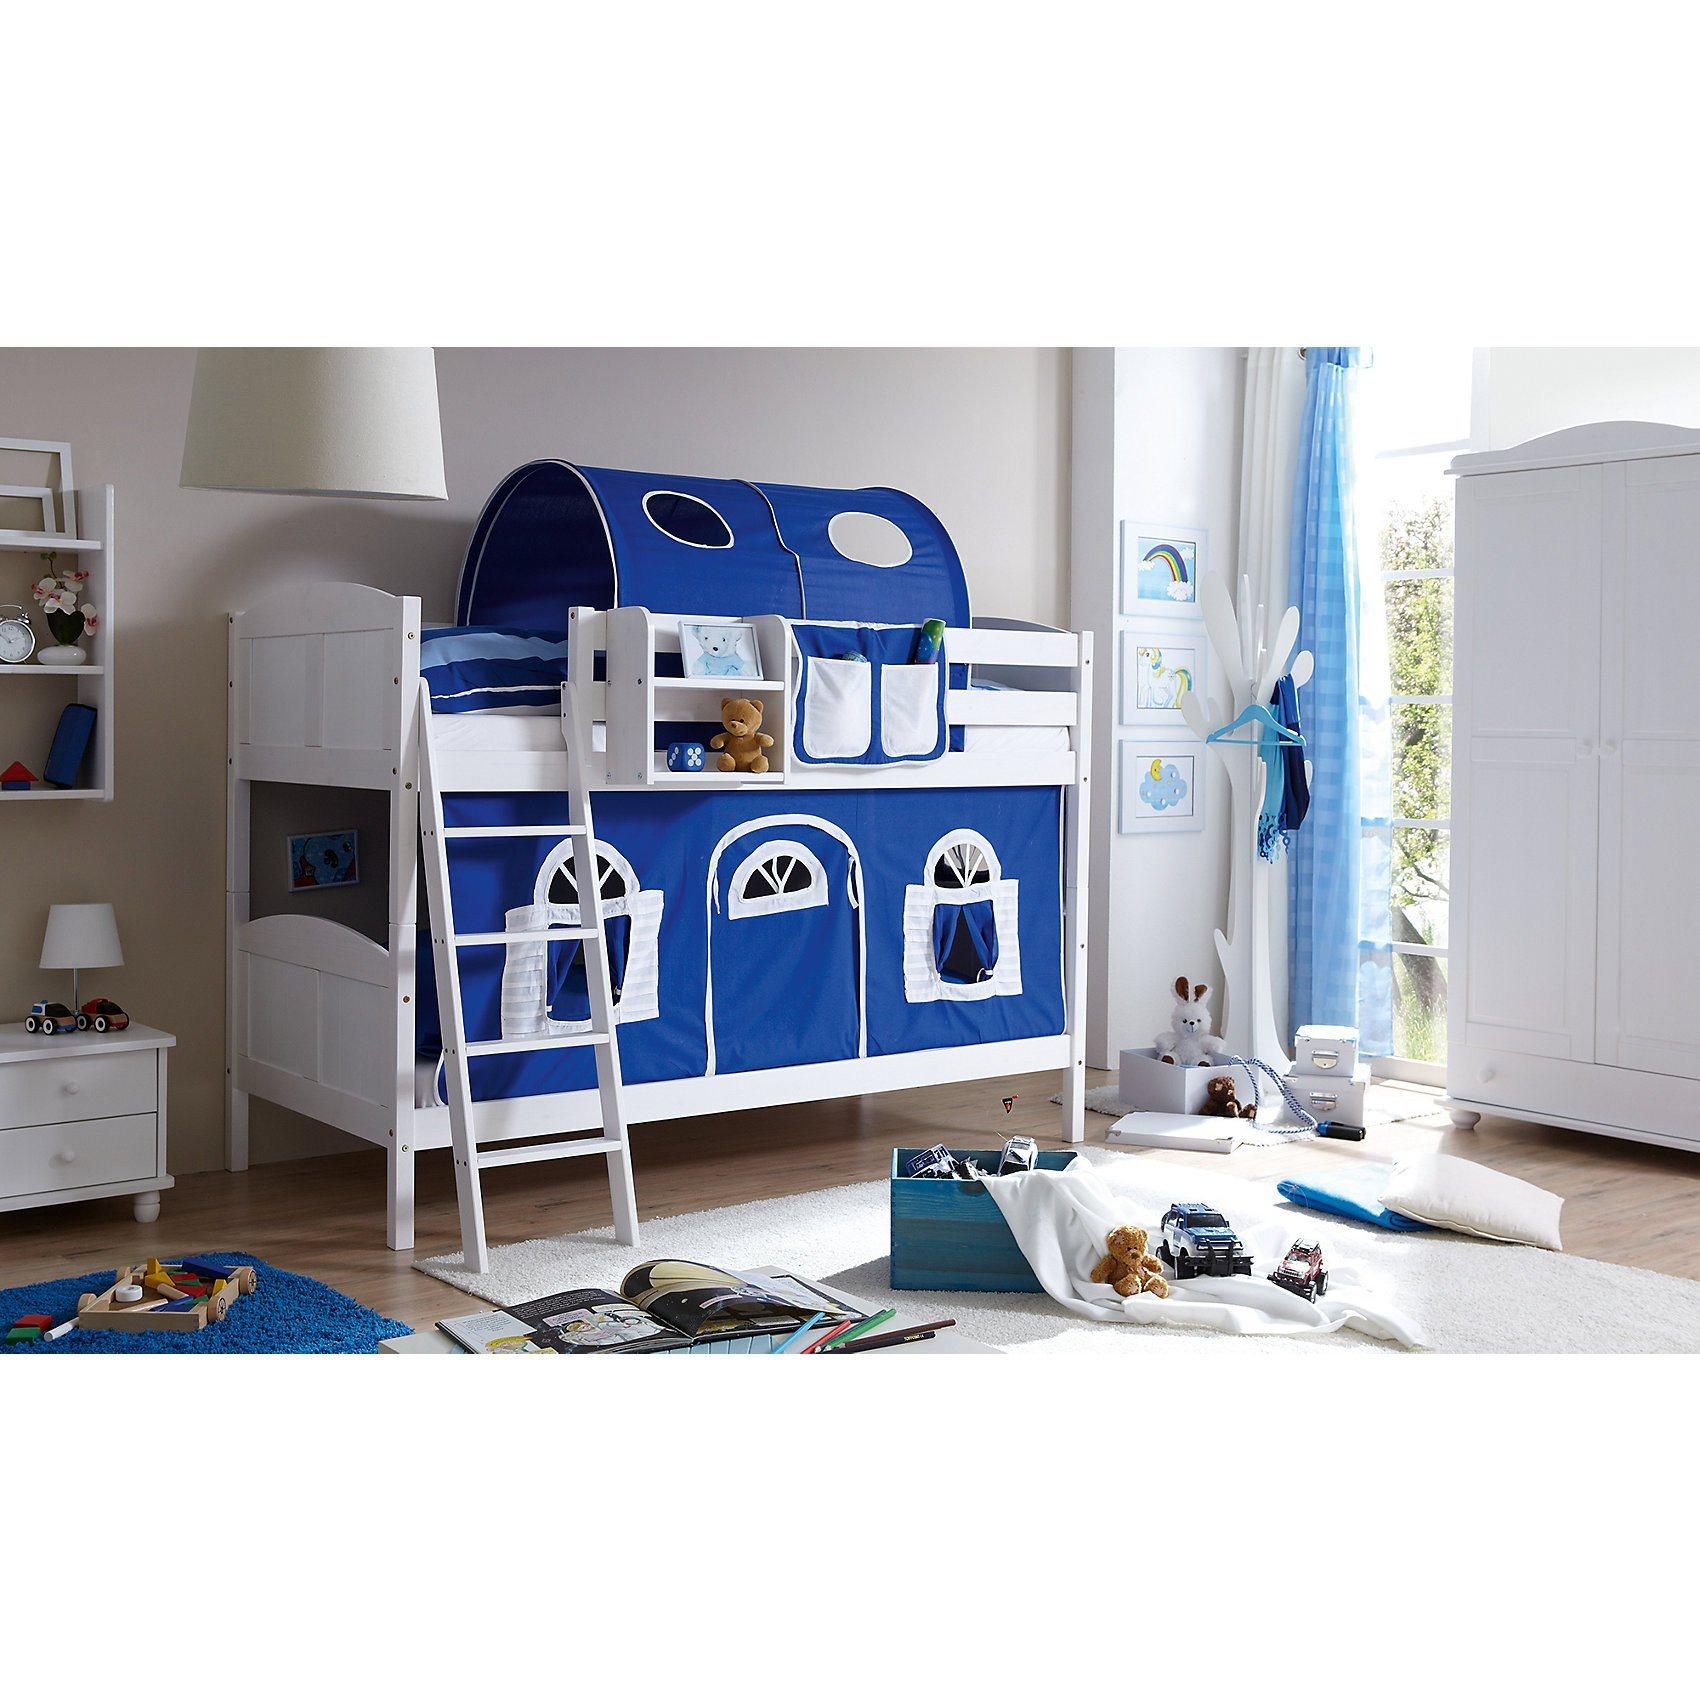 Ticaa Etagenbett Erni Country, Kiefer massiv, weiß lackiert, blau- | Kinderzimmer > Kinderbetten > Etagenbetten | Weiß | Kiefer - Massiv - Lackiert - Baumwolle | Ticaa